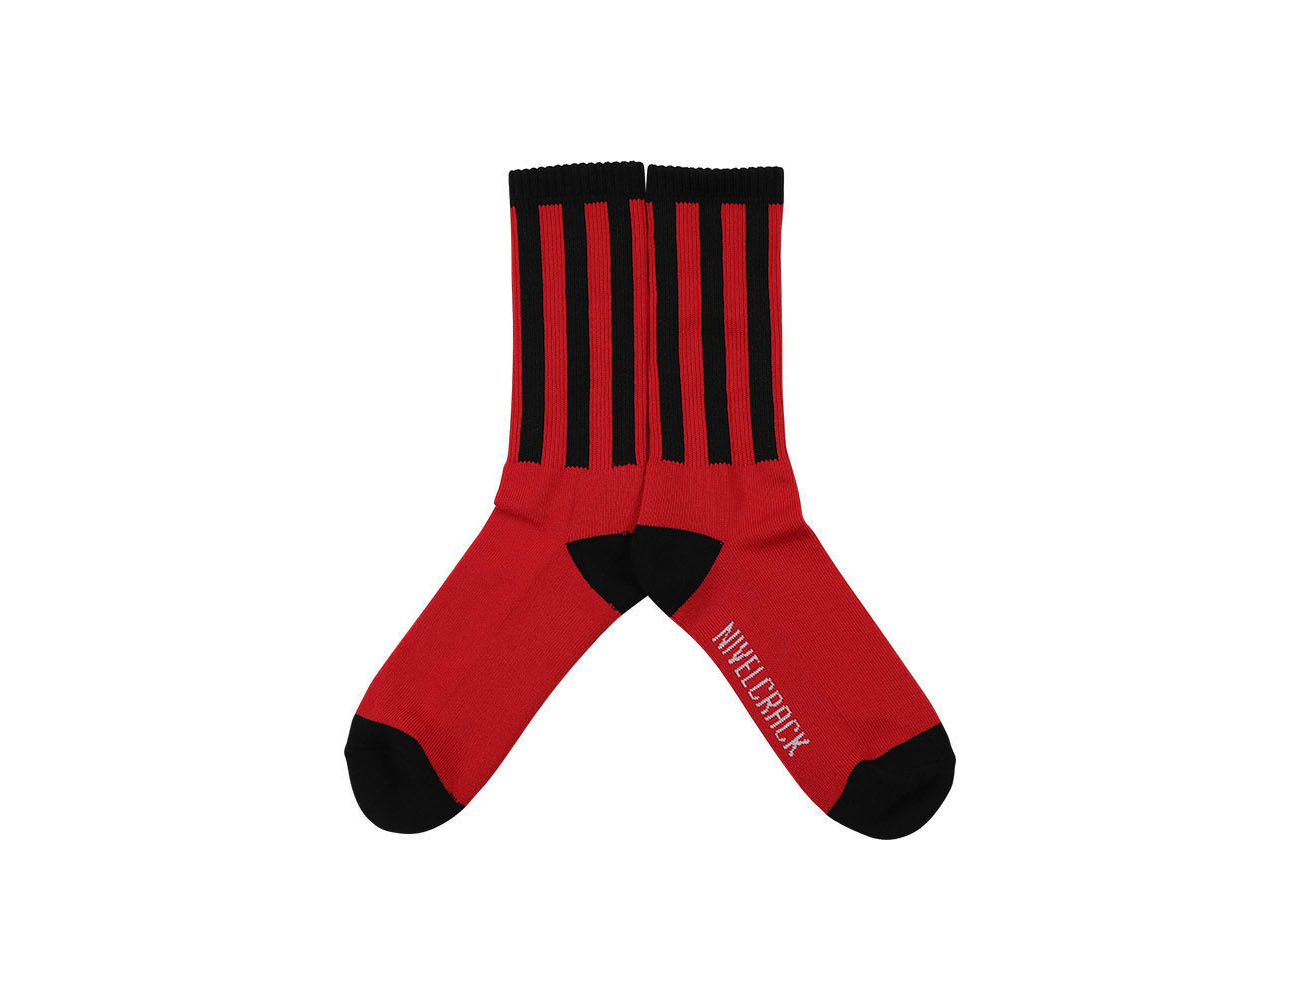 sock_rossoneri